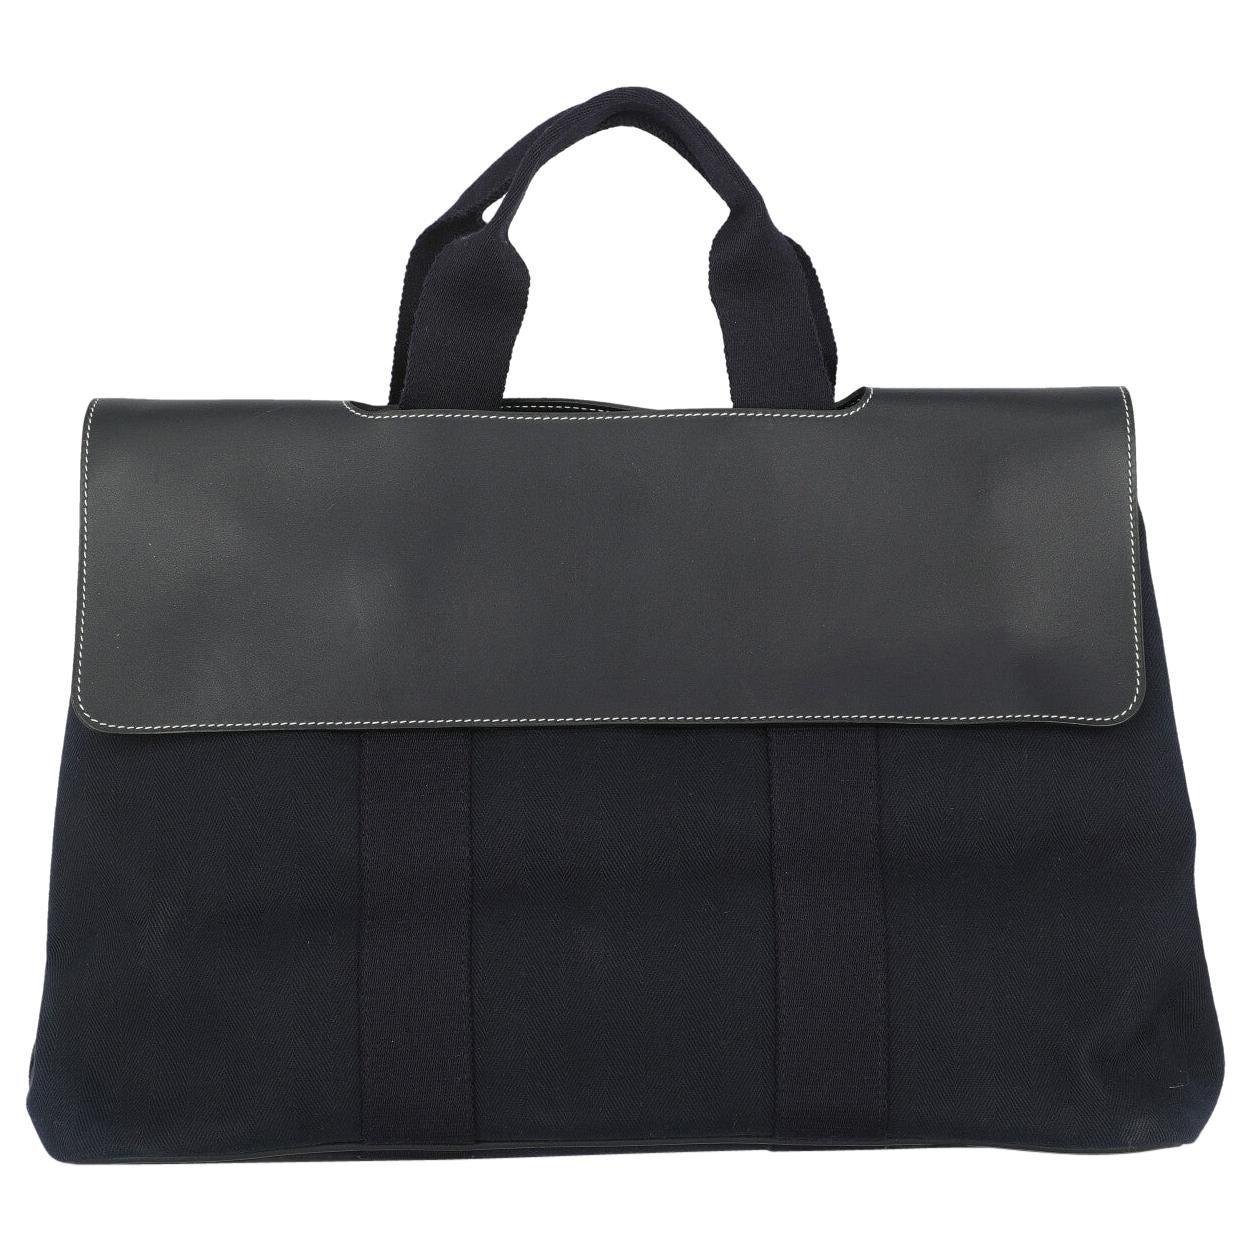 Hermès Woman Handbag  Navy Fabric